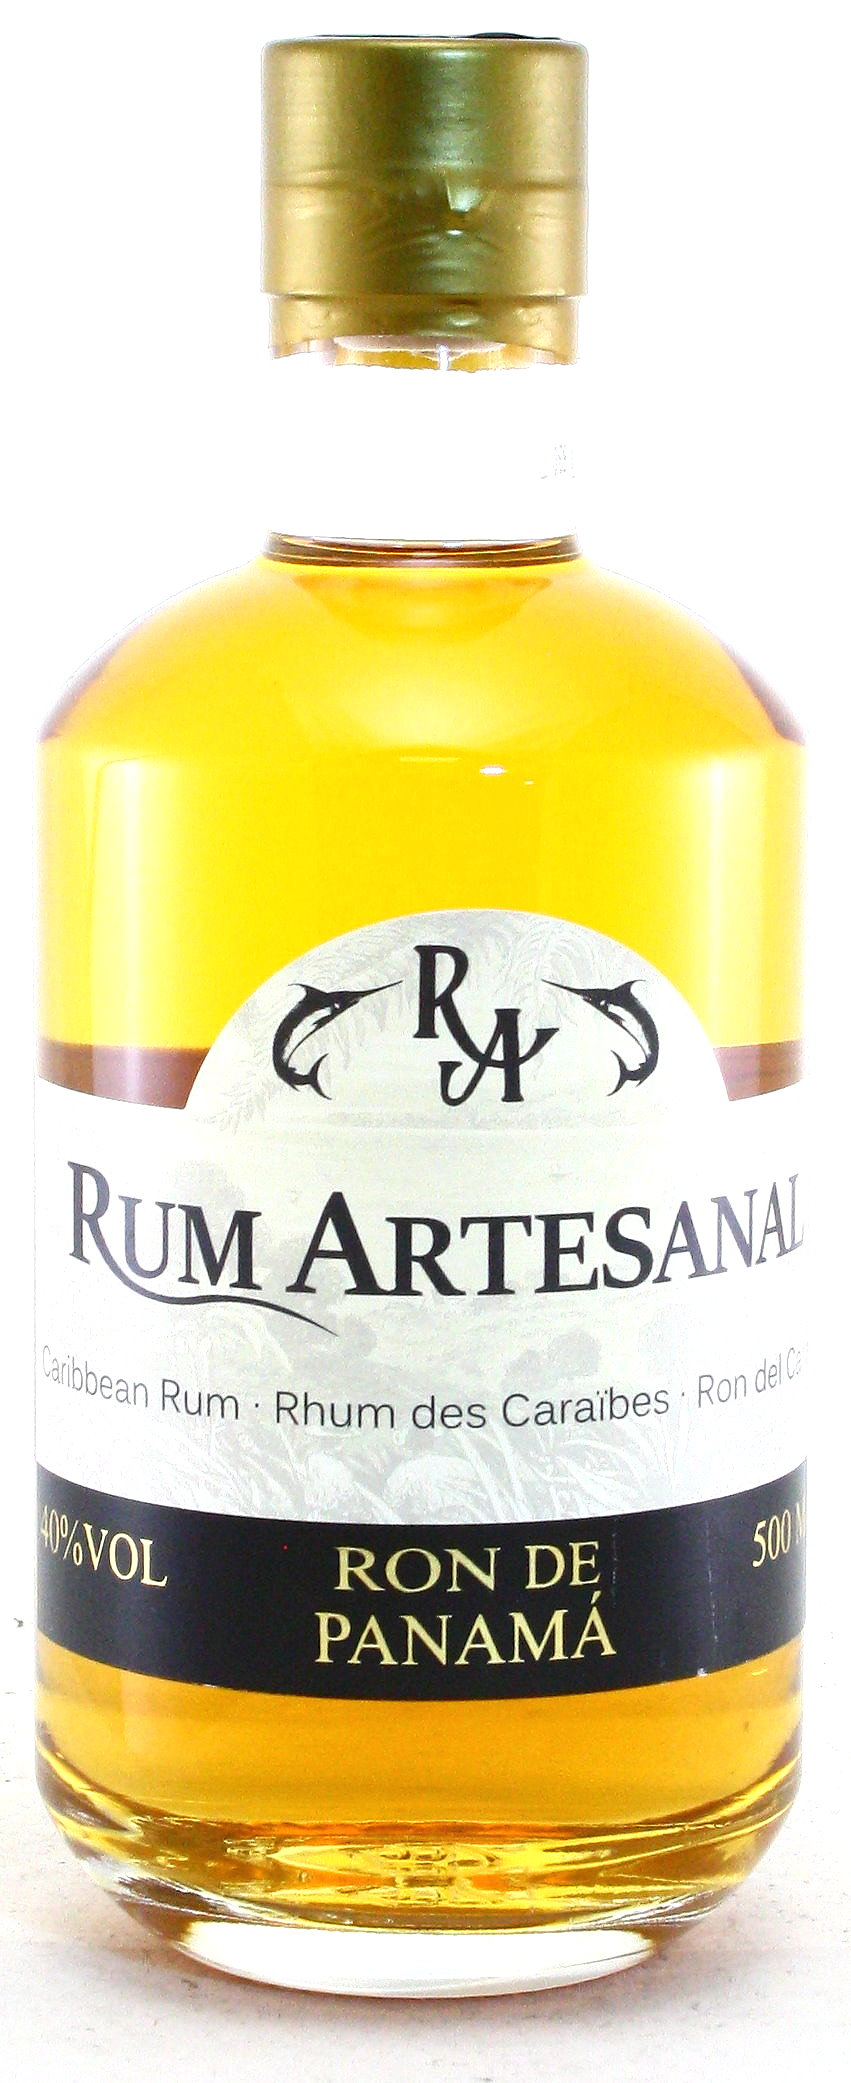 500 ml Ron de Panama, Rum Artesanal Panama